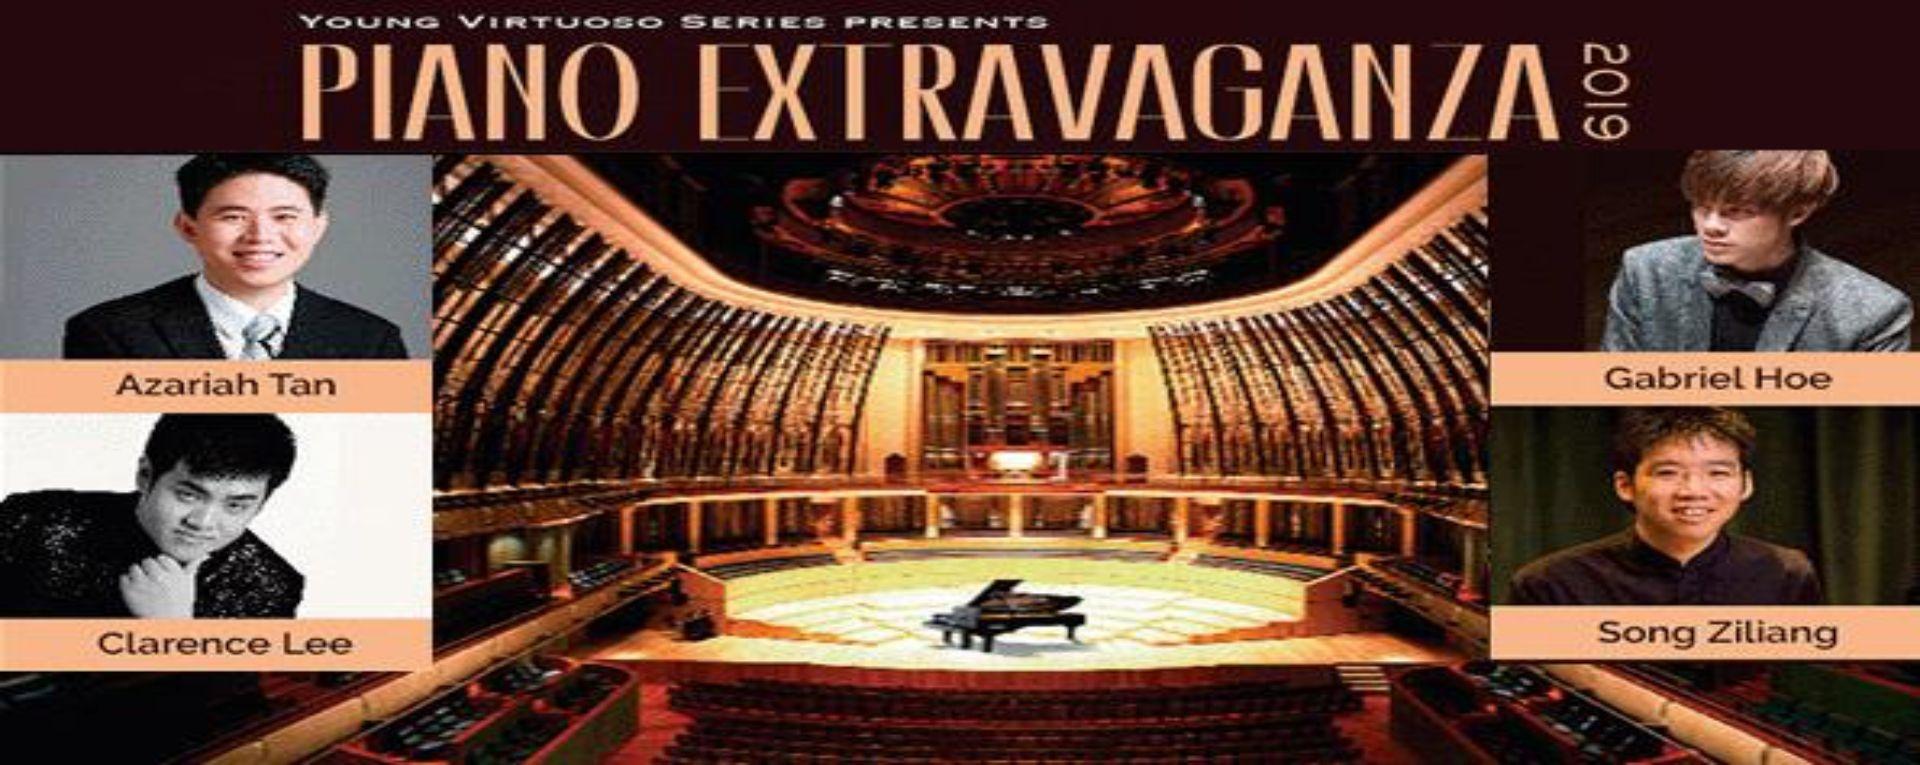 Young Virtuoso Series Presents: Piano Extravaganza 2019